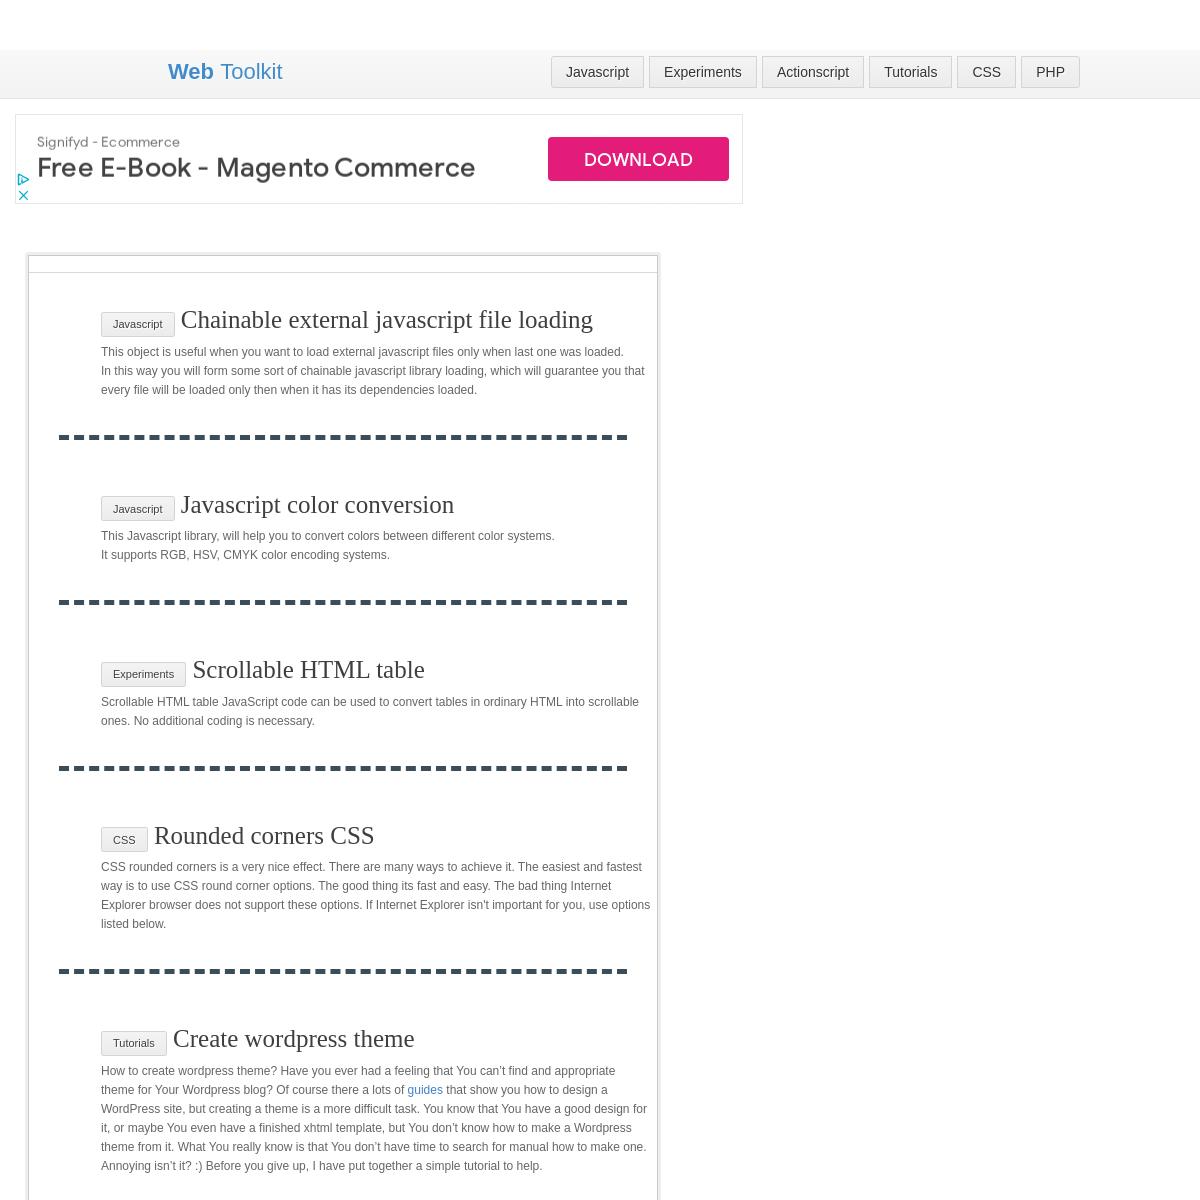 webtoolkit.info - Code Snippets Repository